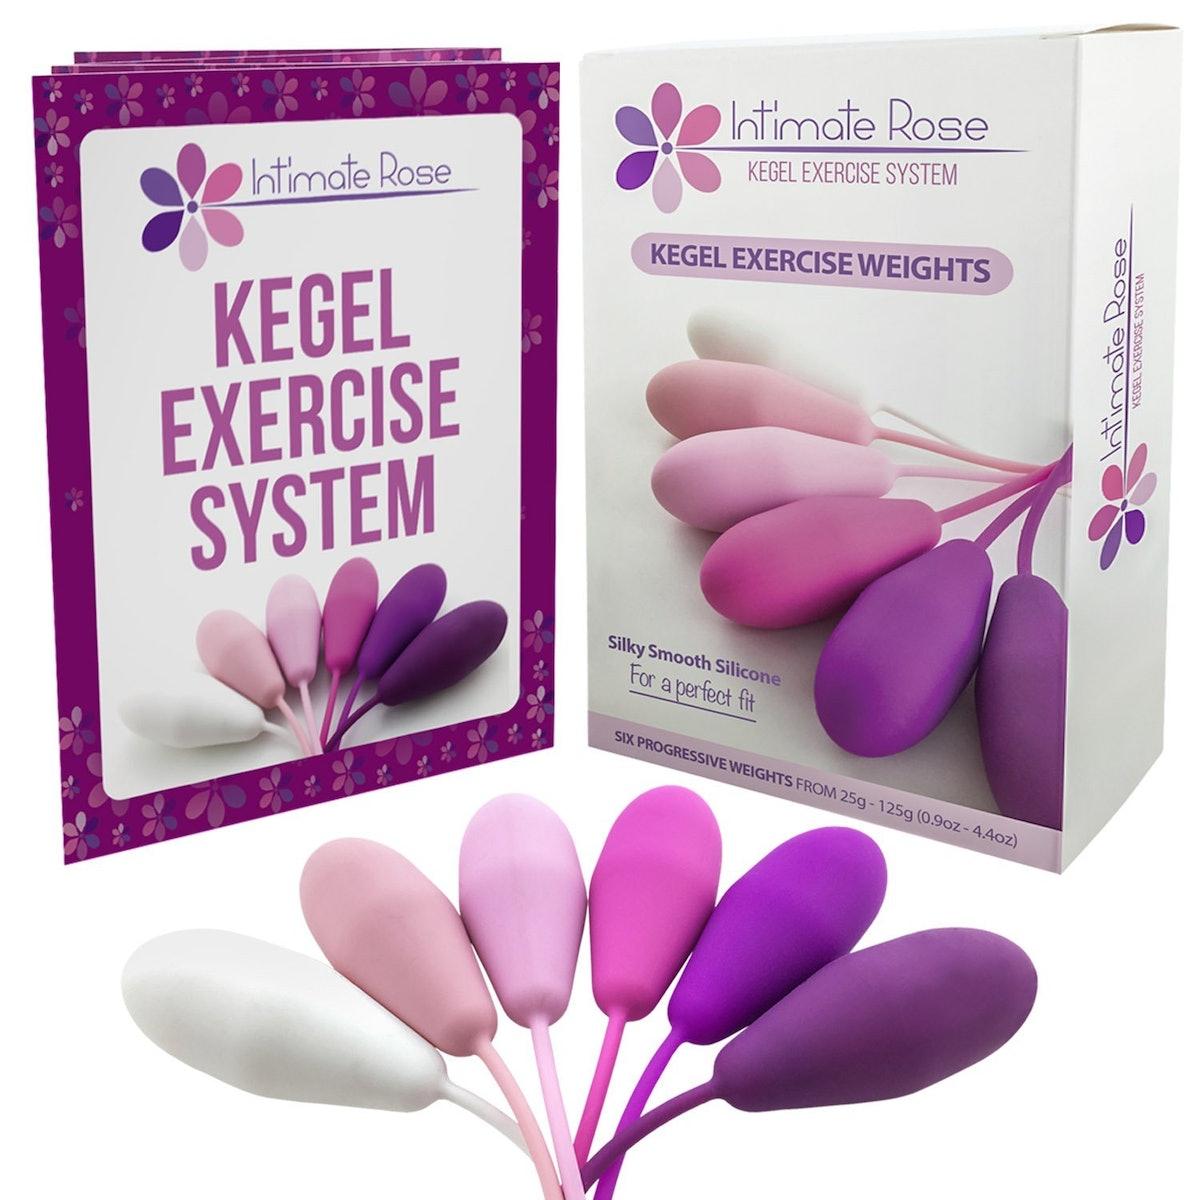 Intimate Rose Kegel Exercise System